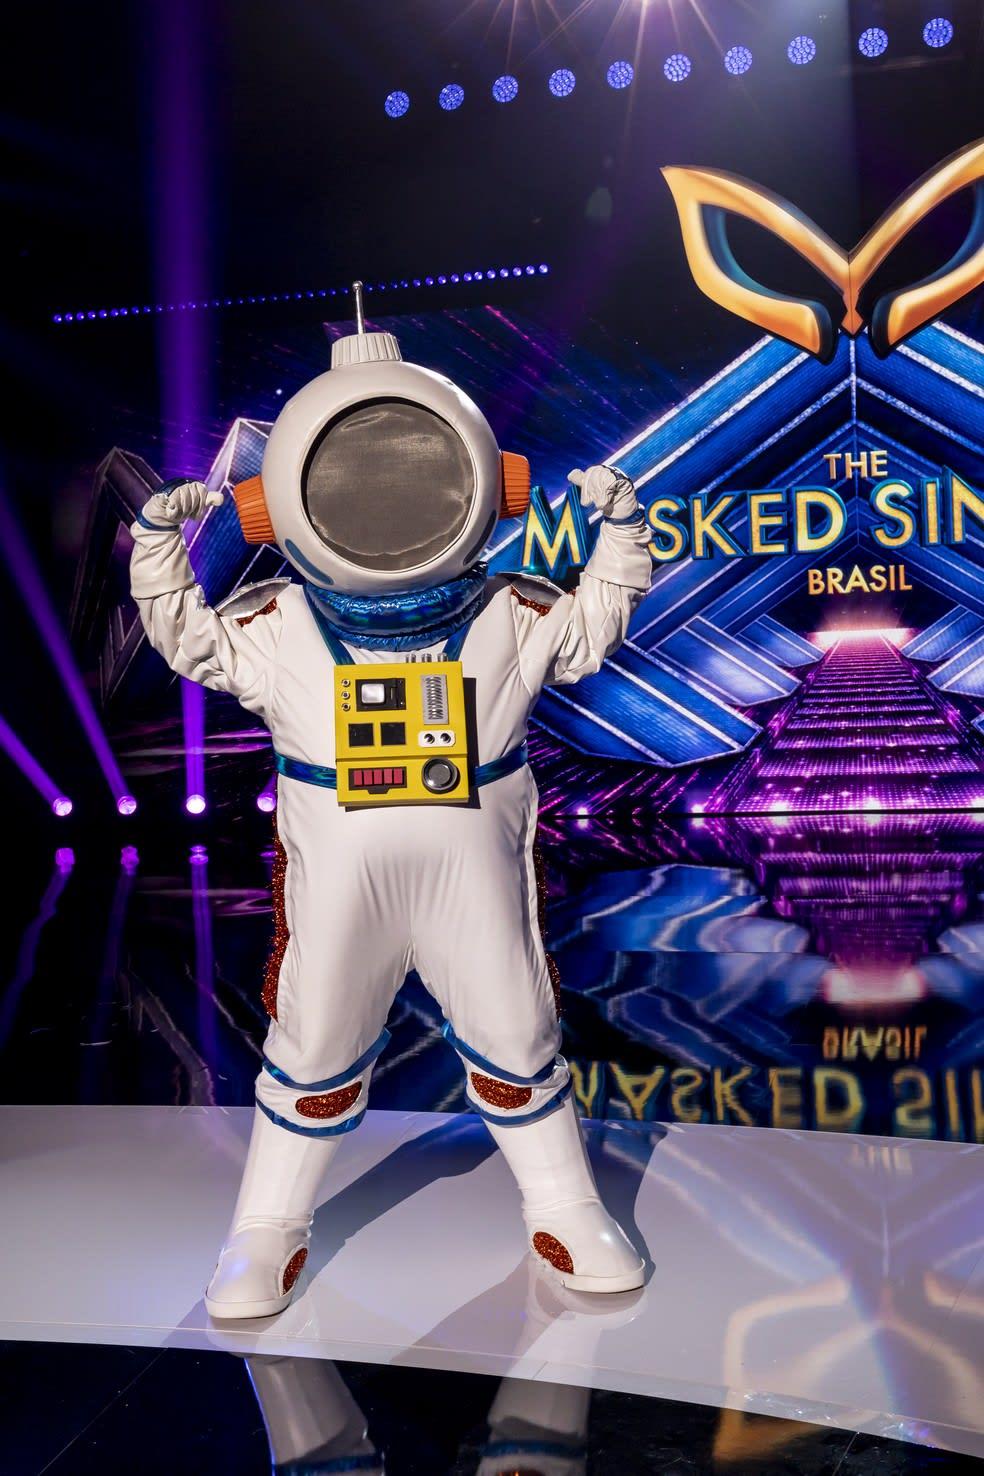 Astronauta The Masked Singer Brasil